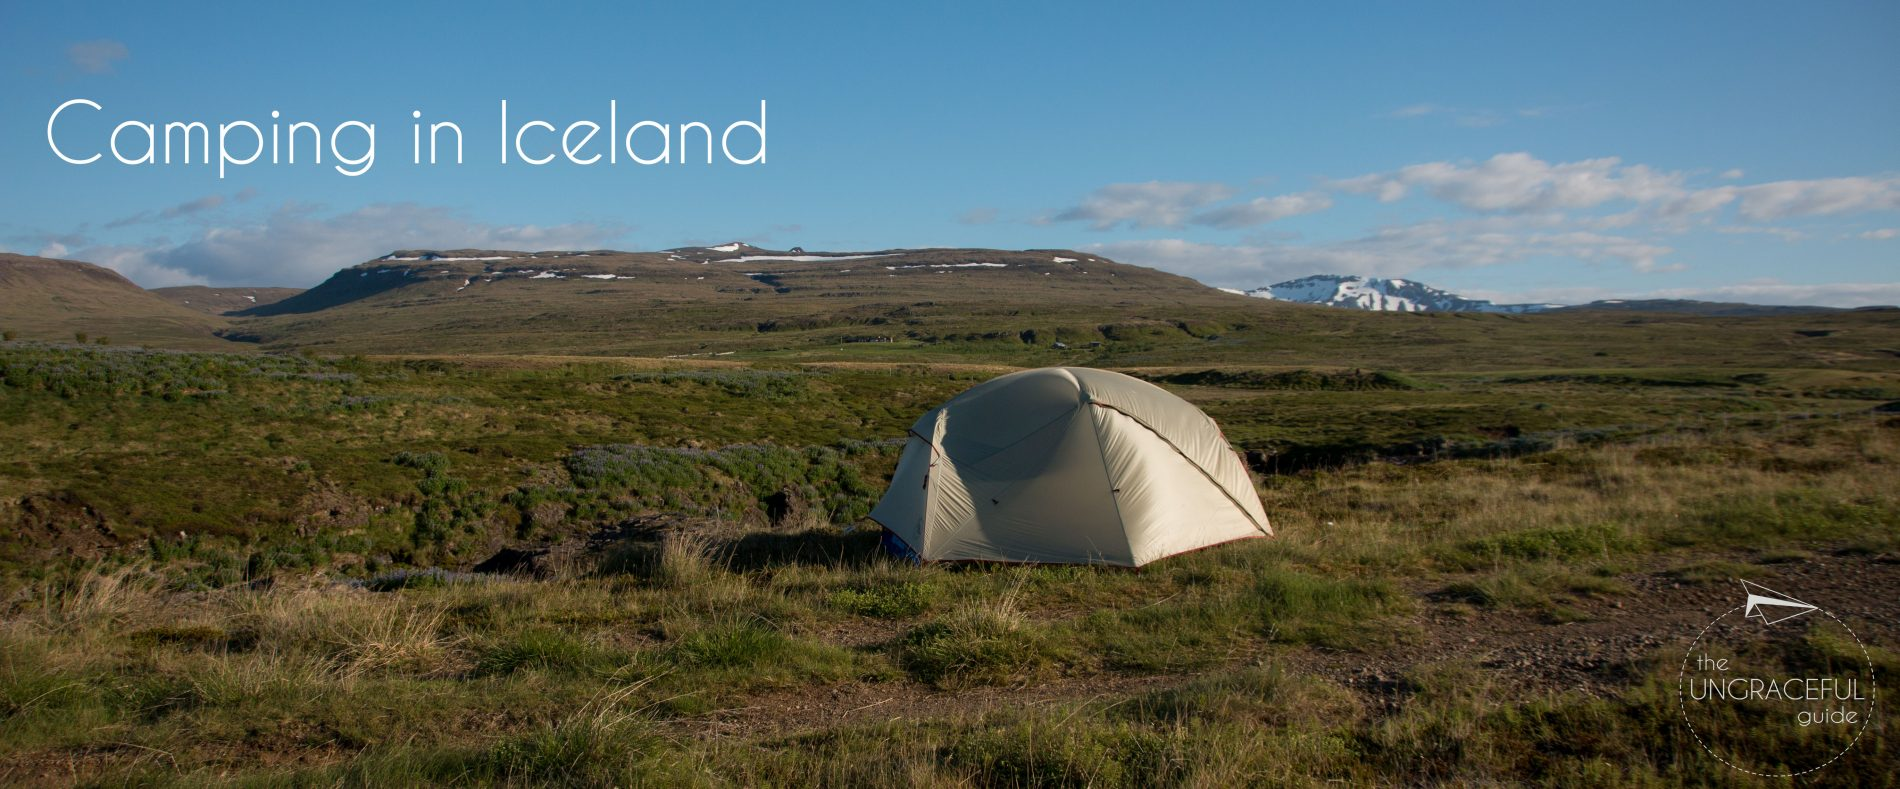 "<img src=""data:image/gif;base64,R0lGODdhAQABAPAAAP///wAAACwAAAAAAQABAEACAkQBADs="" data-lazy-src=""images/"" width=""800"" height=""600"" alt=""iceland - camping - Iceland: How to get the most on a budget"">"